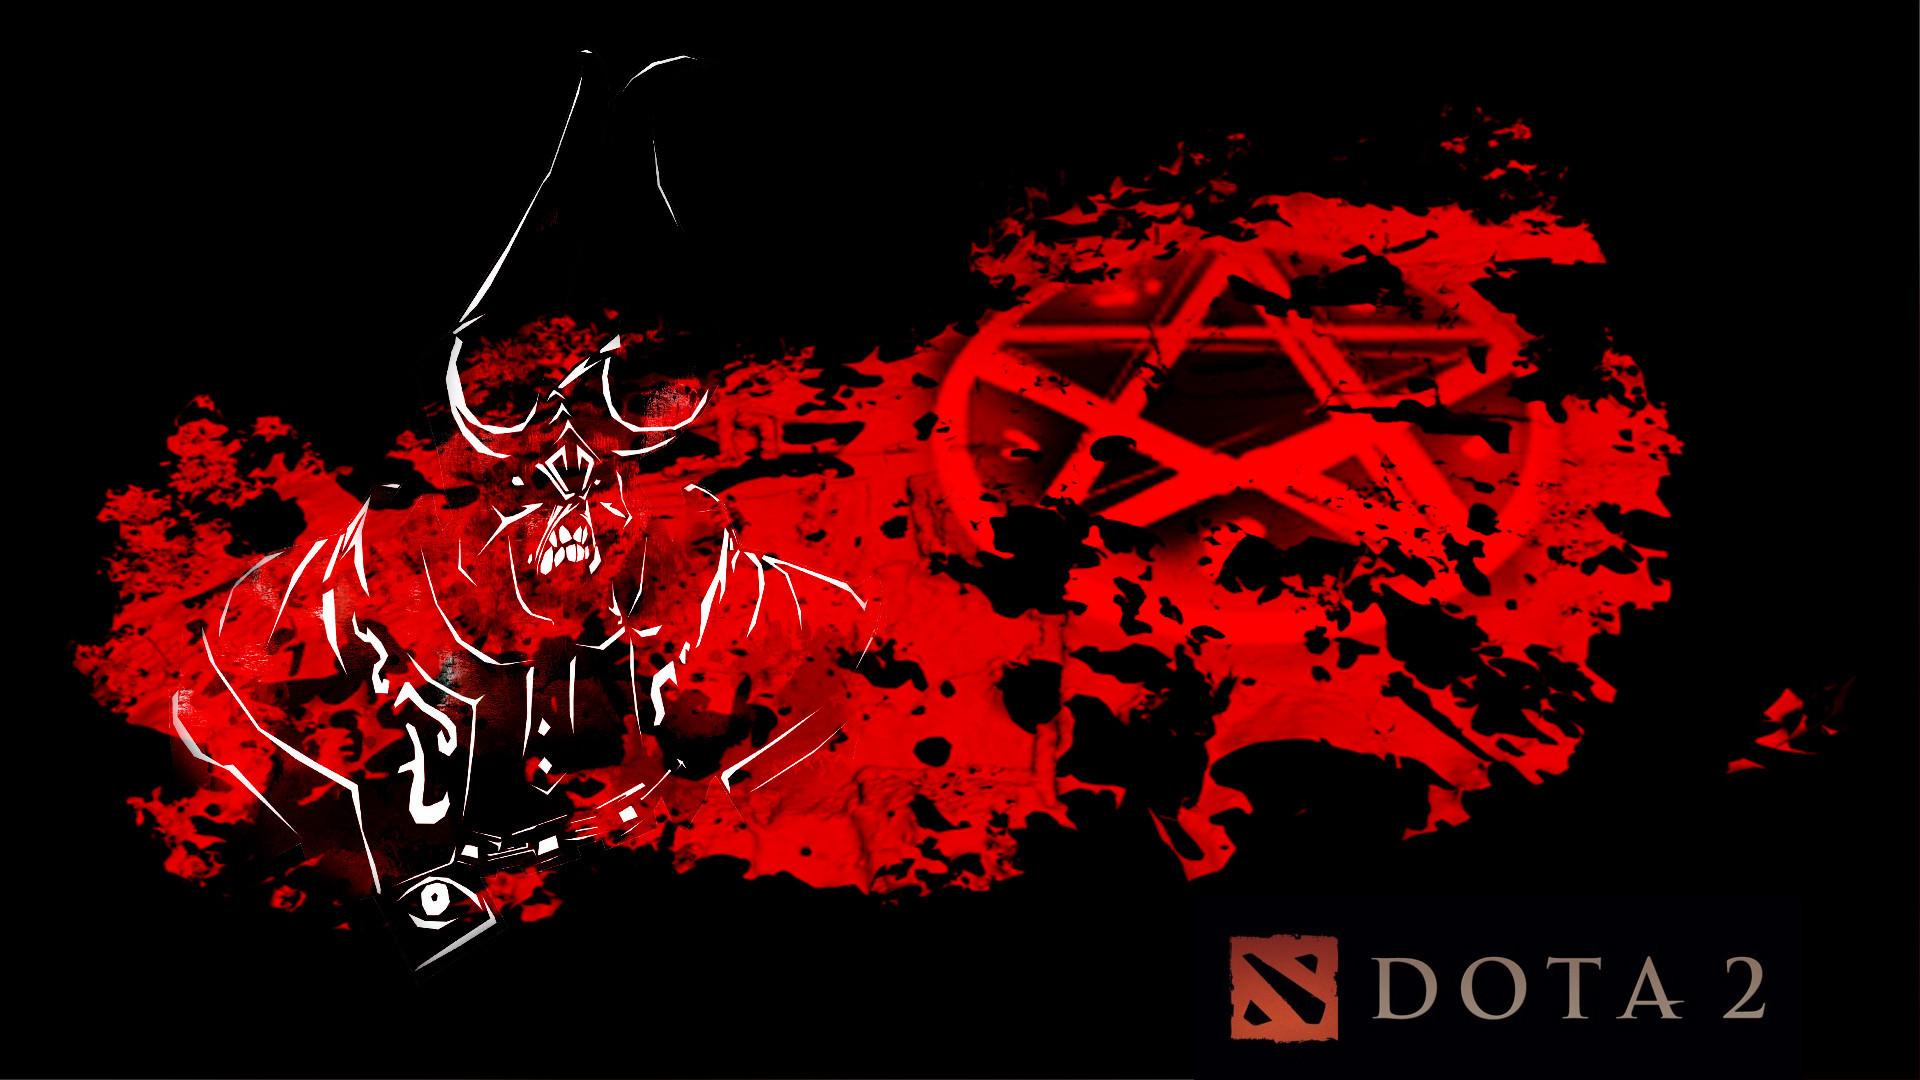 Inverted Pentagram Wallpaper Here's a doom wallpaper i